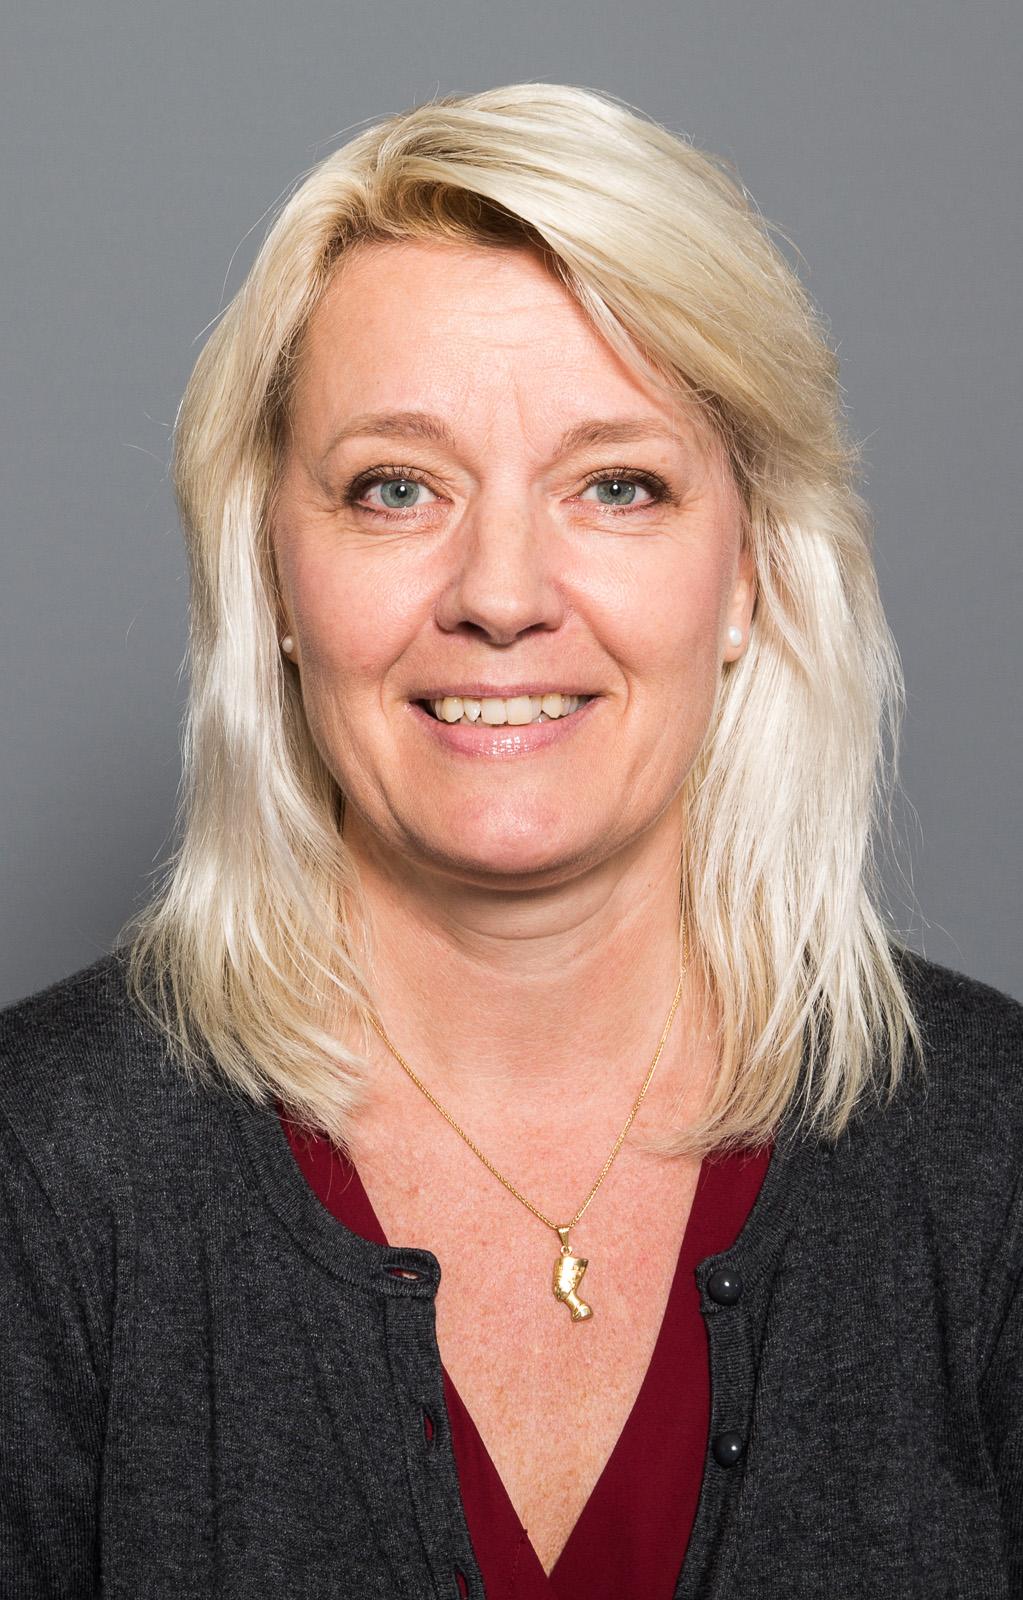 Ann-Katrine Holme Christoffersen